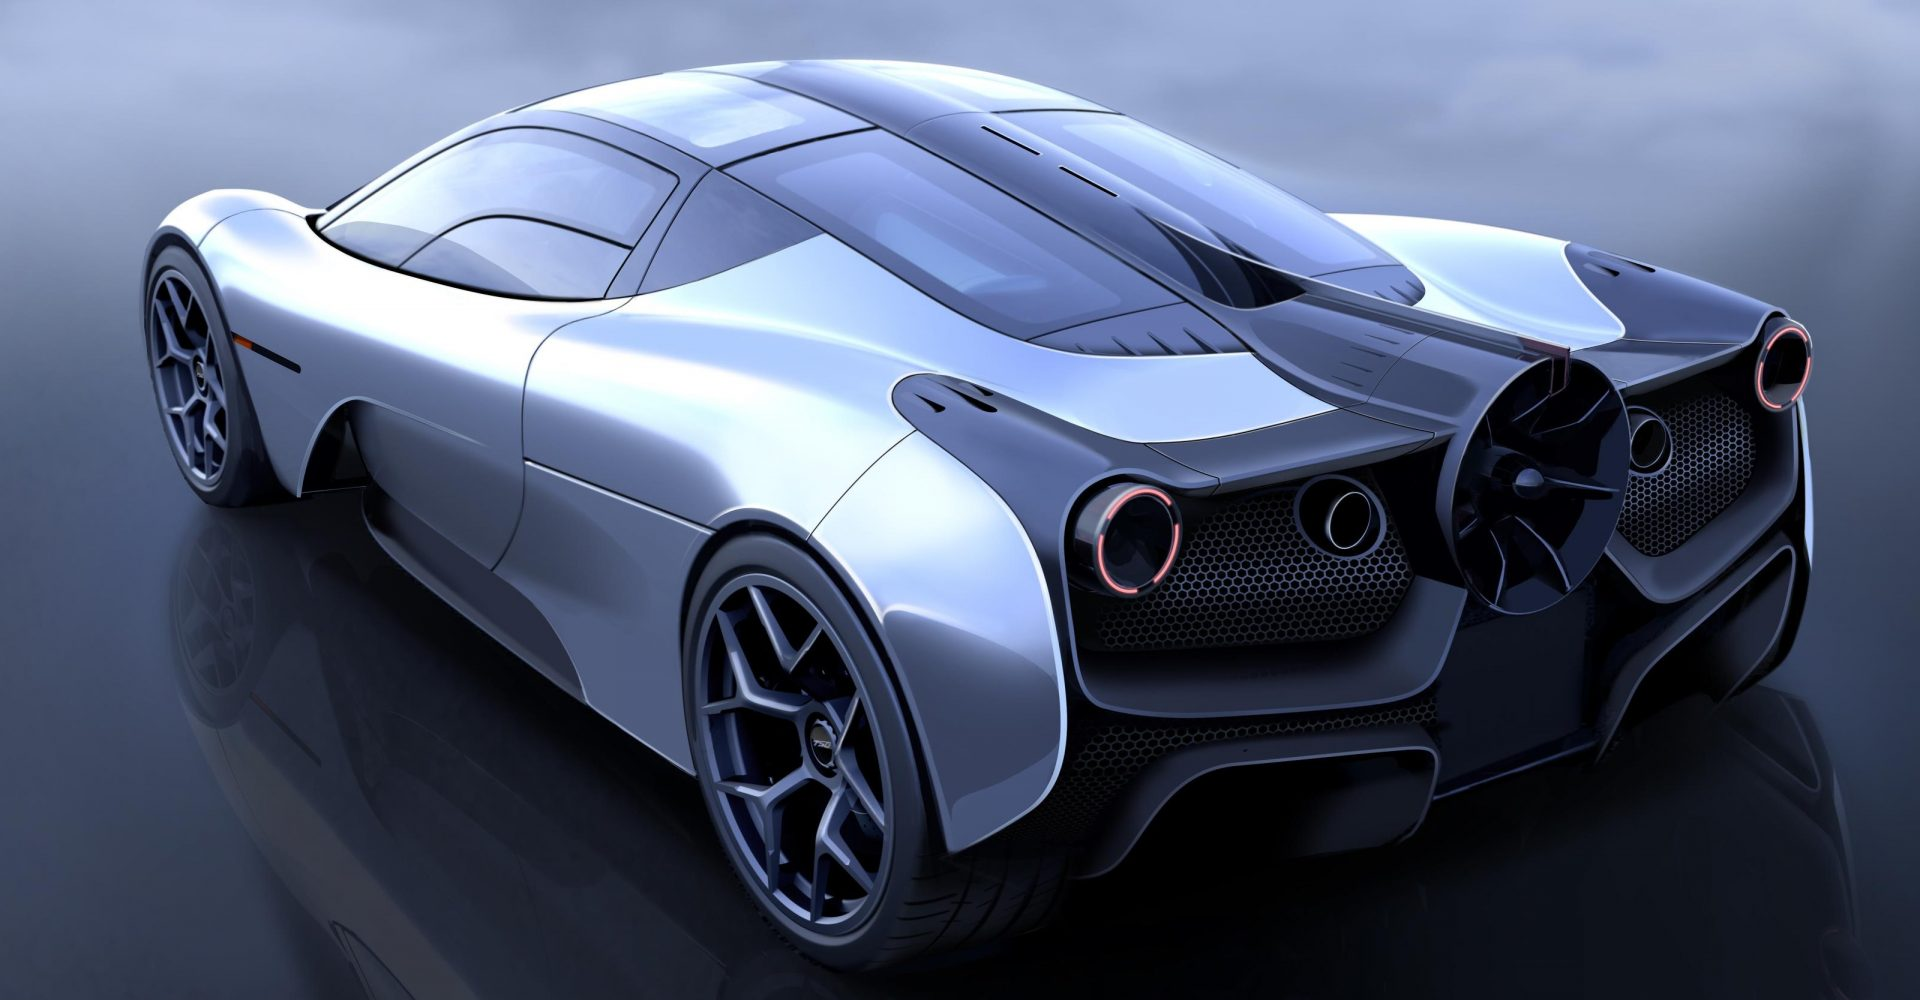 New image of Gordon Murray Automotive T.50 supercar showcased